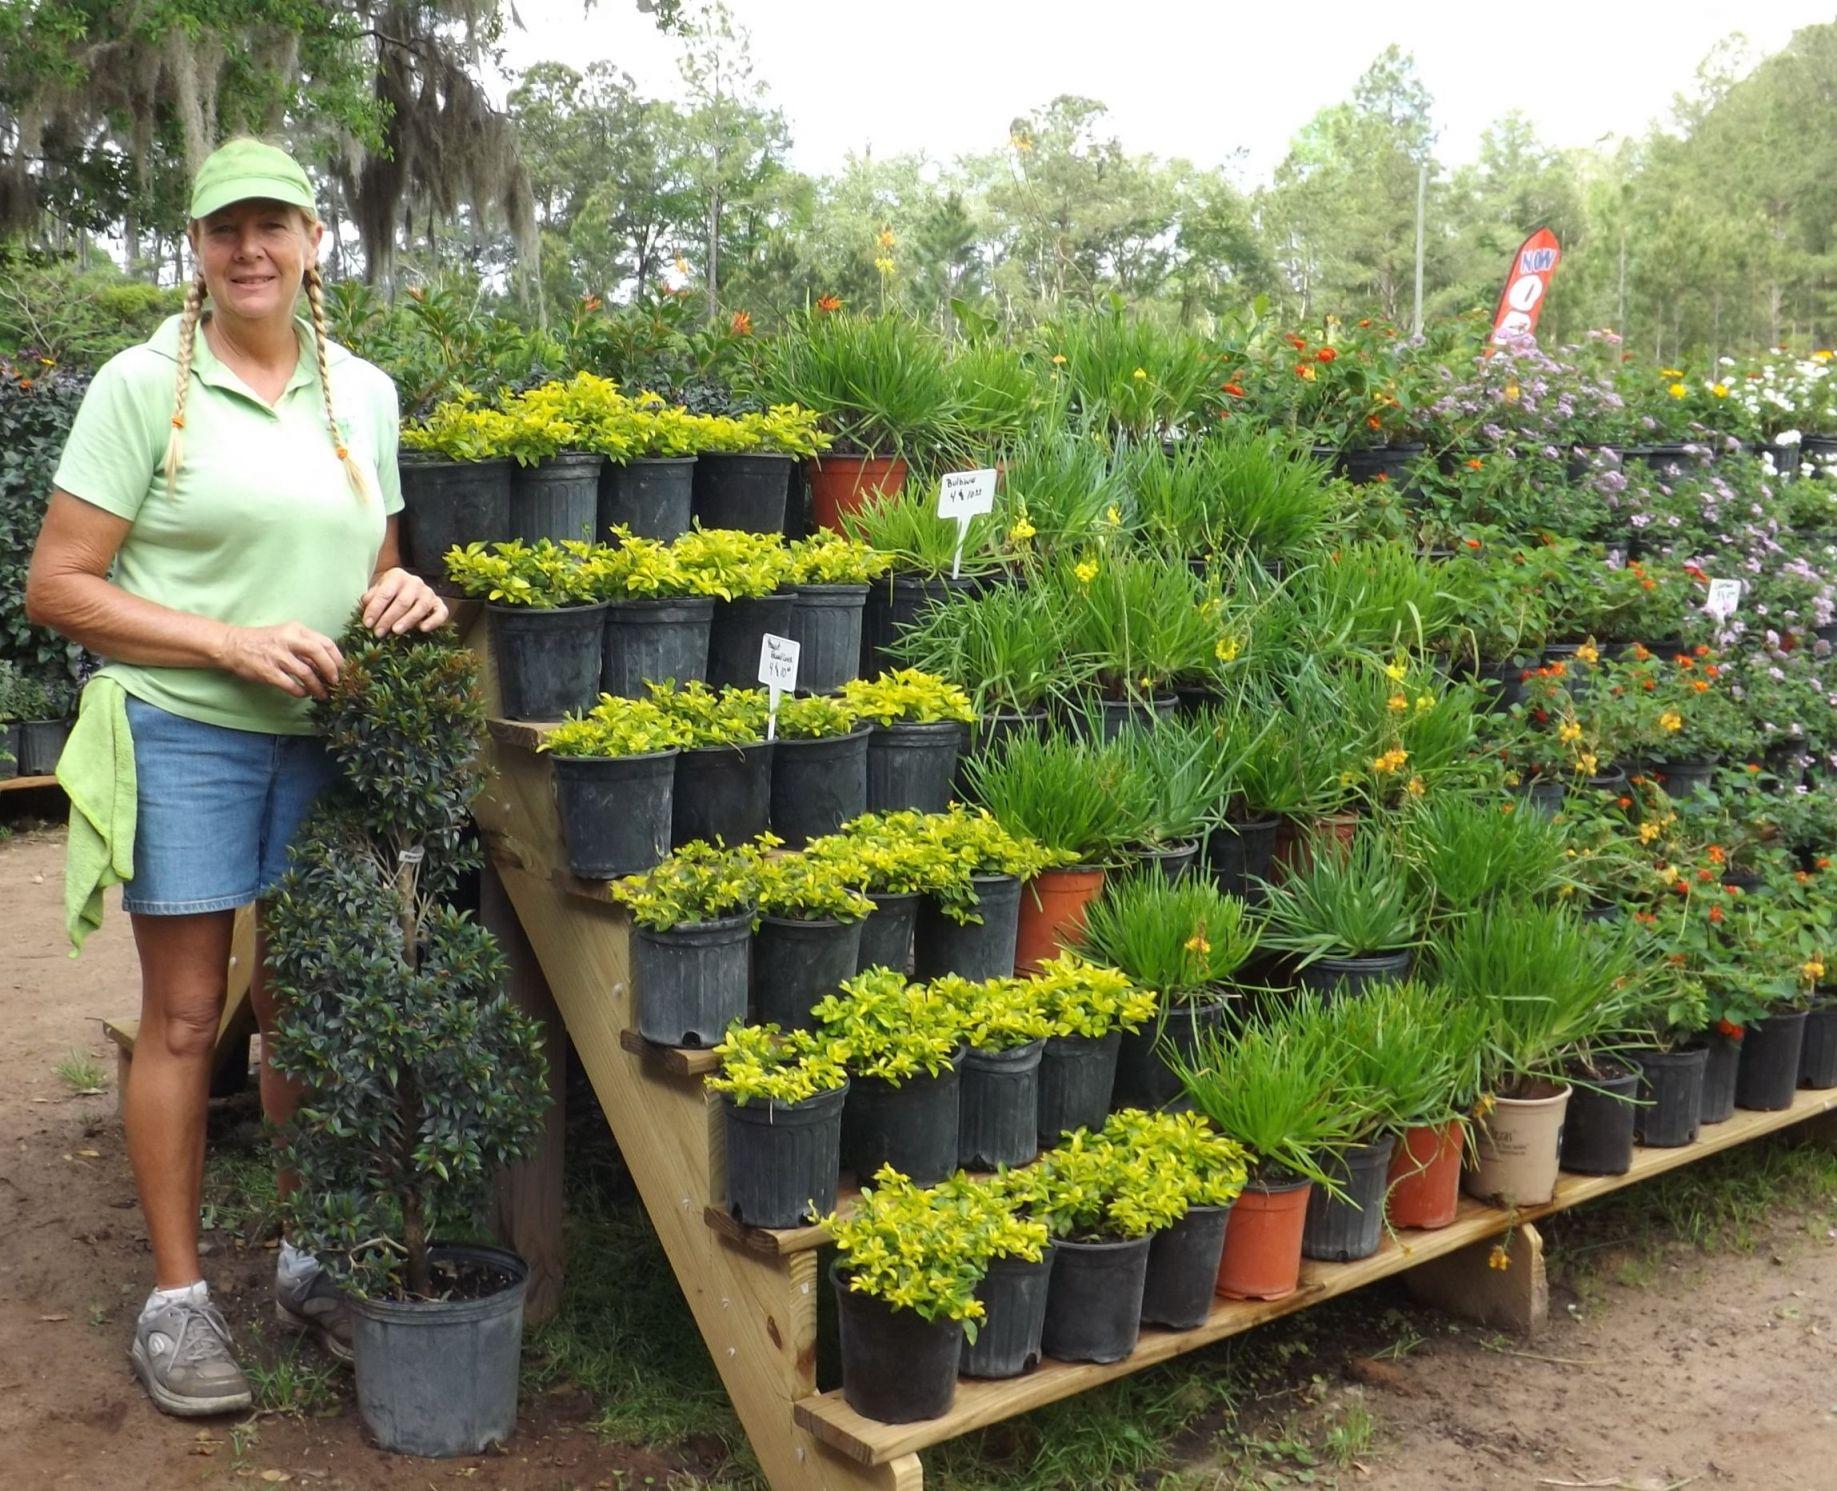 Adorable Plant Nursery Business Ideas